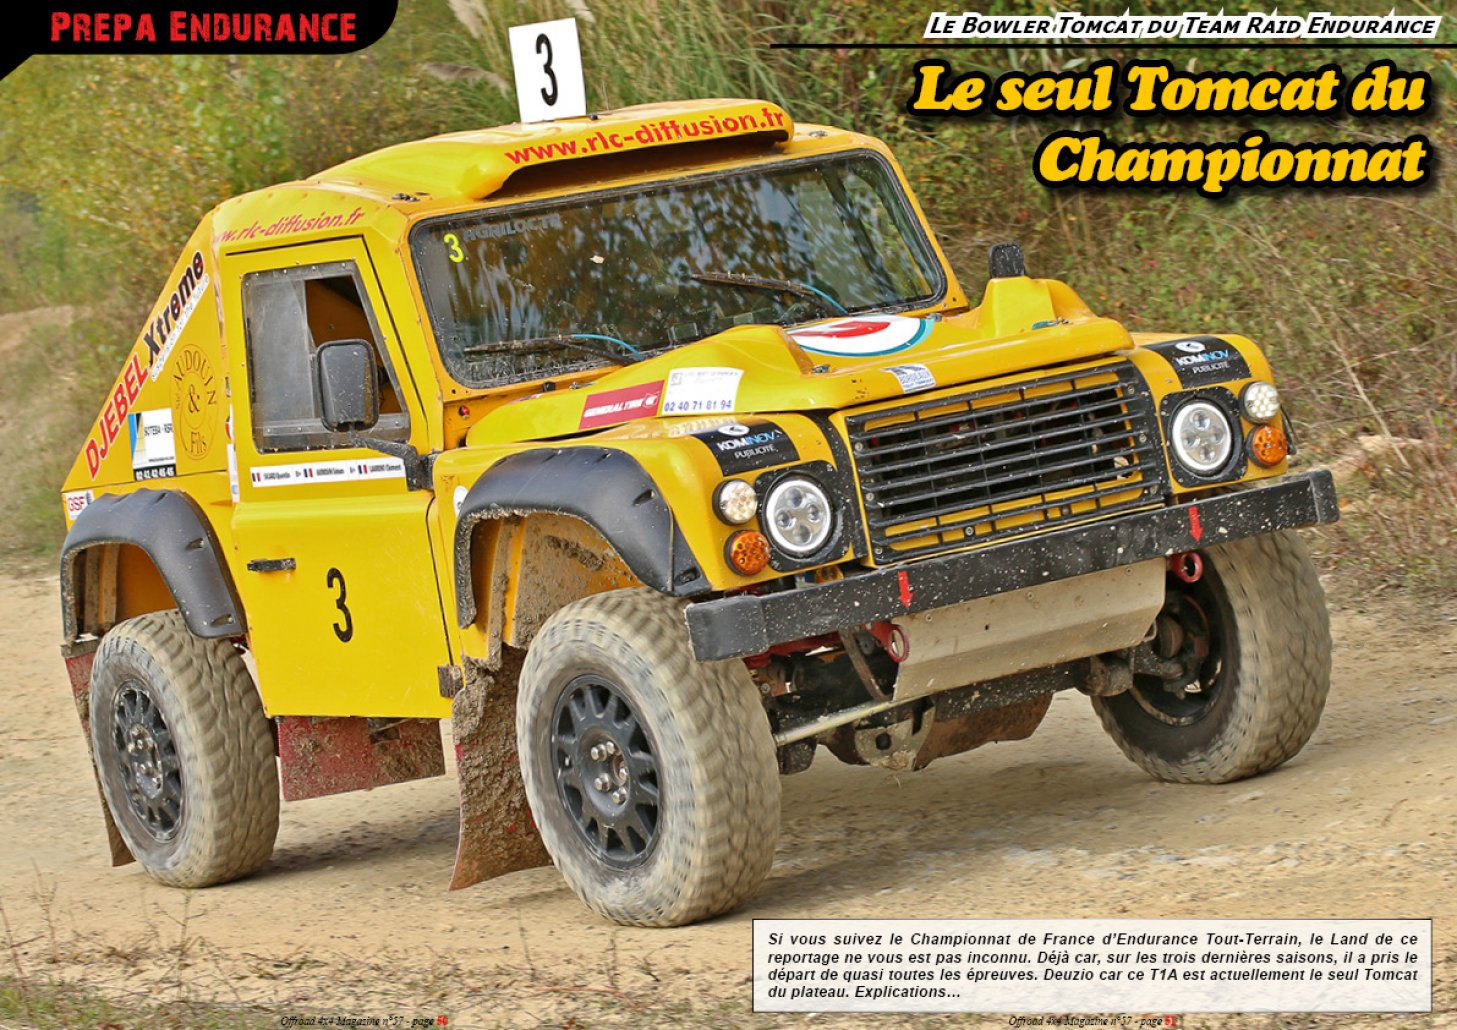 Le Bowler Tomcat du Team Raid Endurance